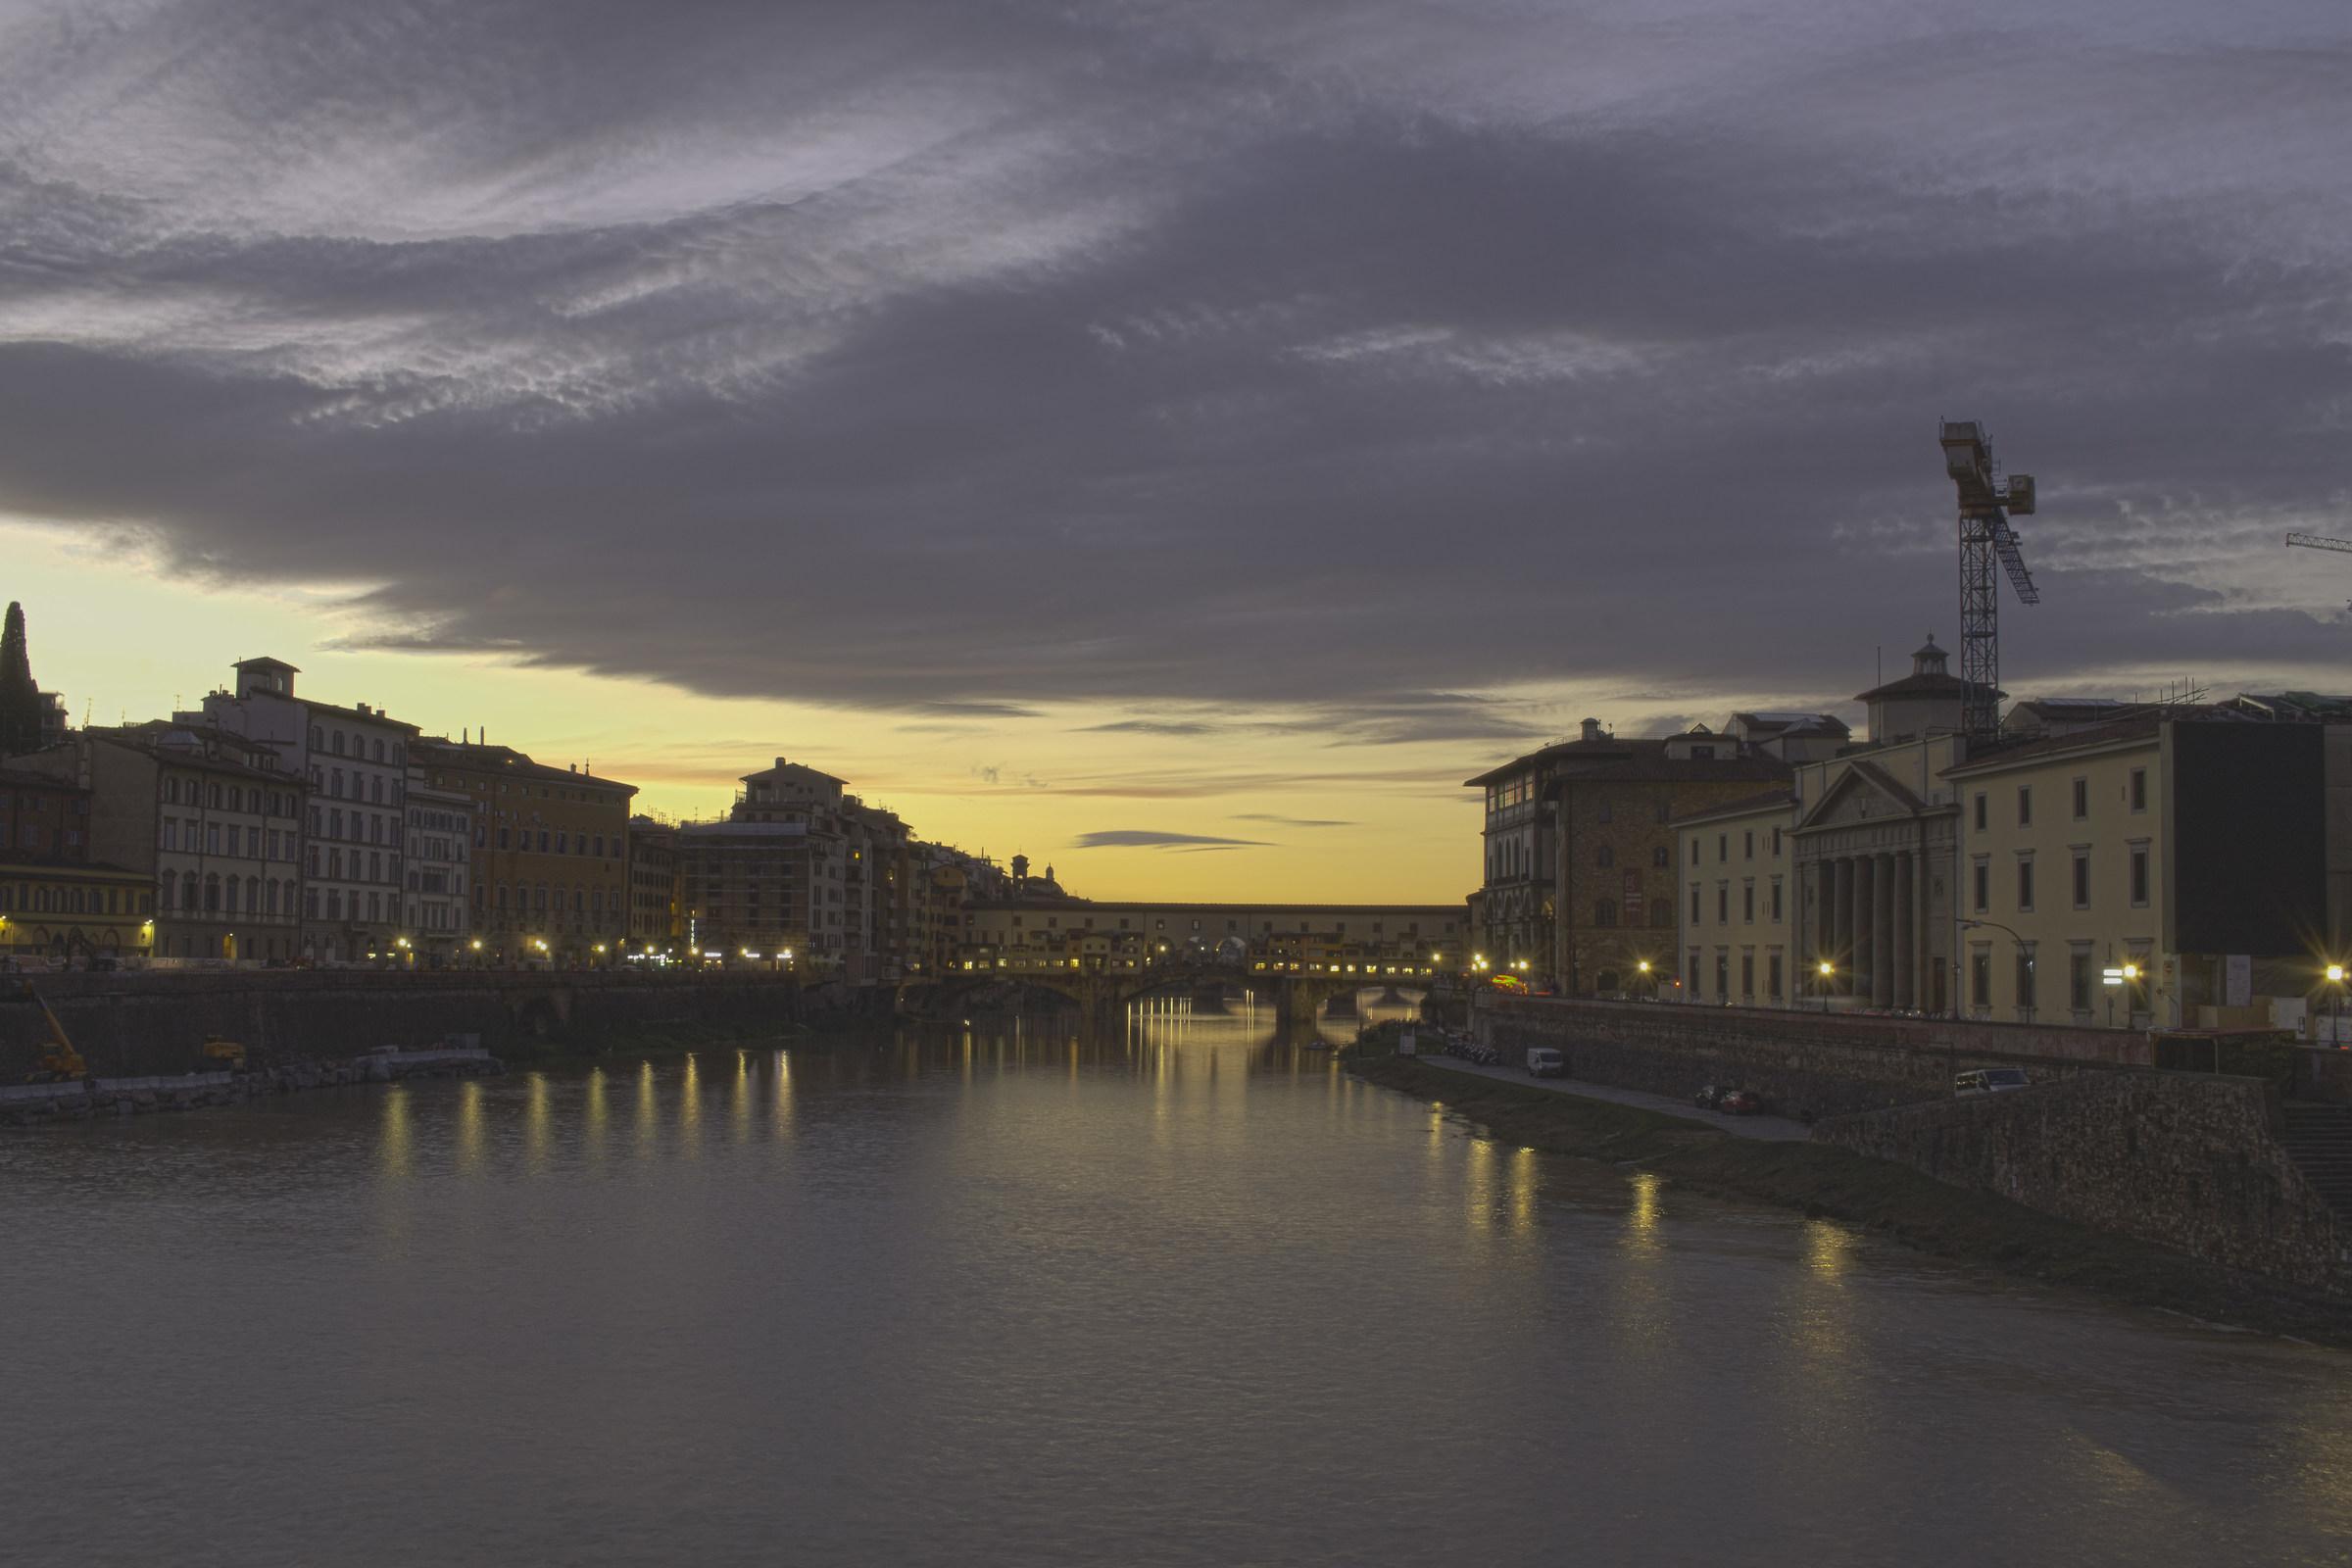 Old Bridge at dusk...